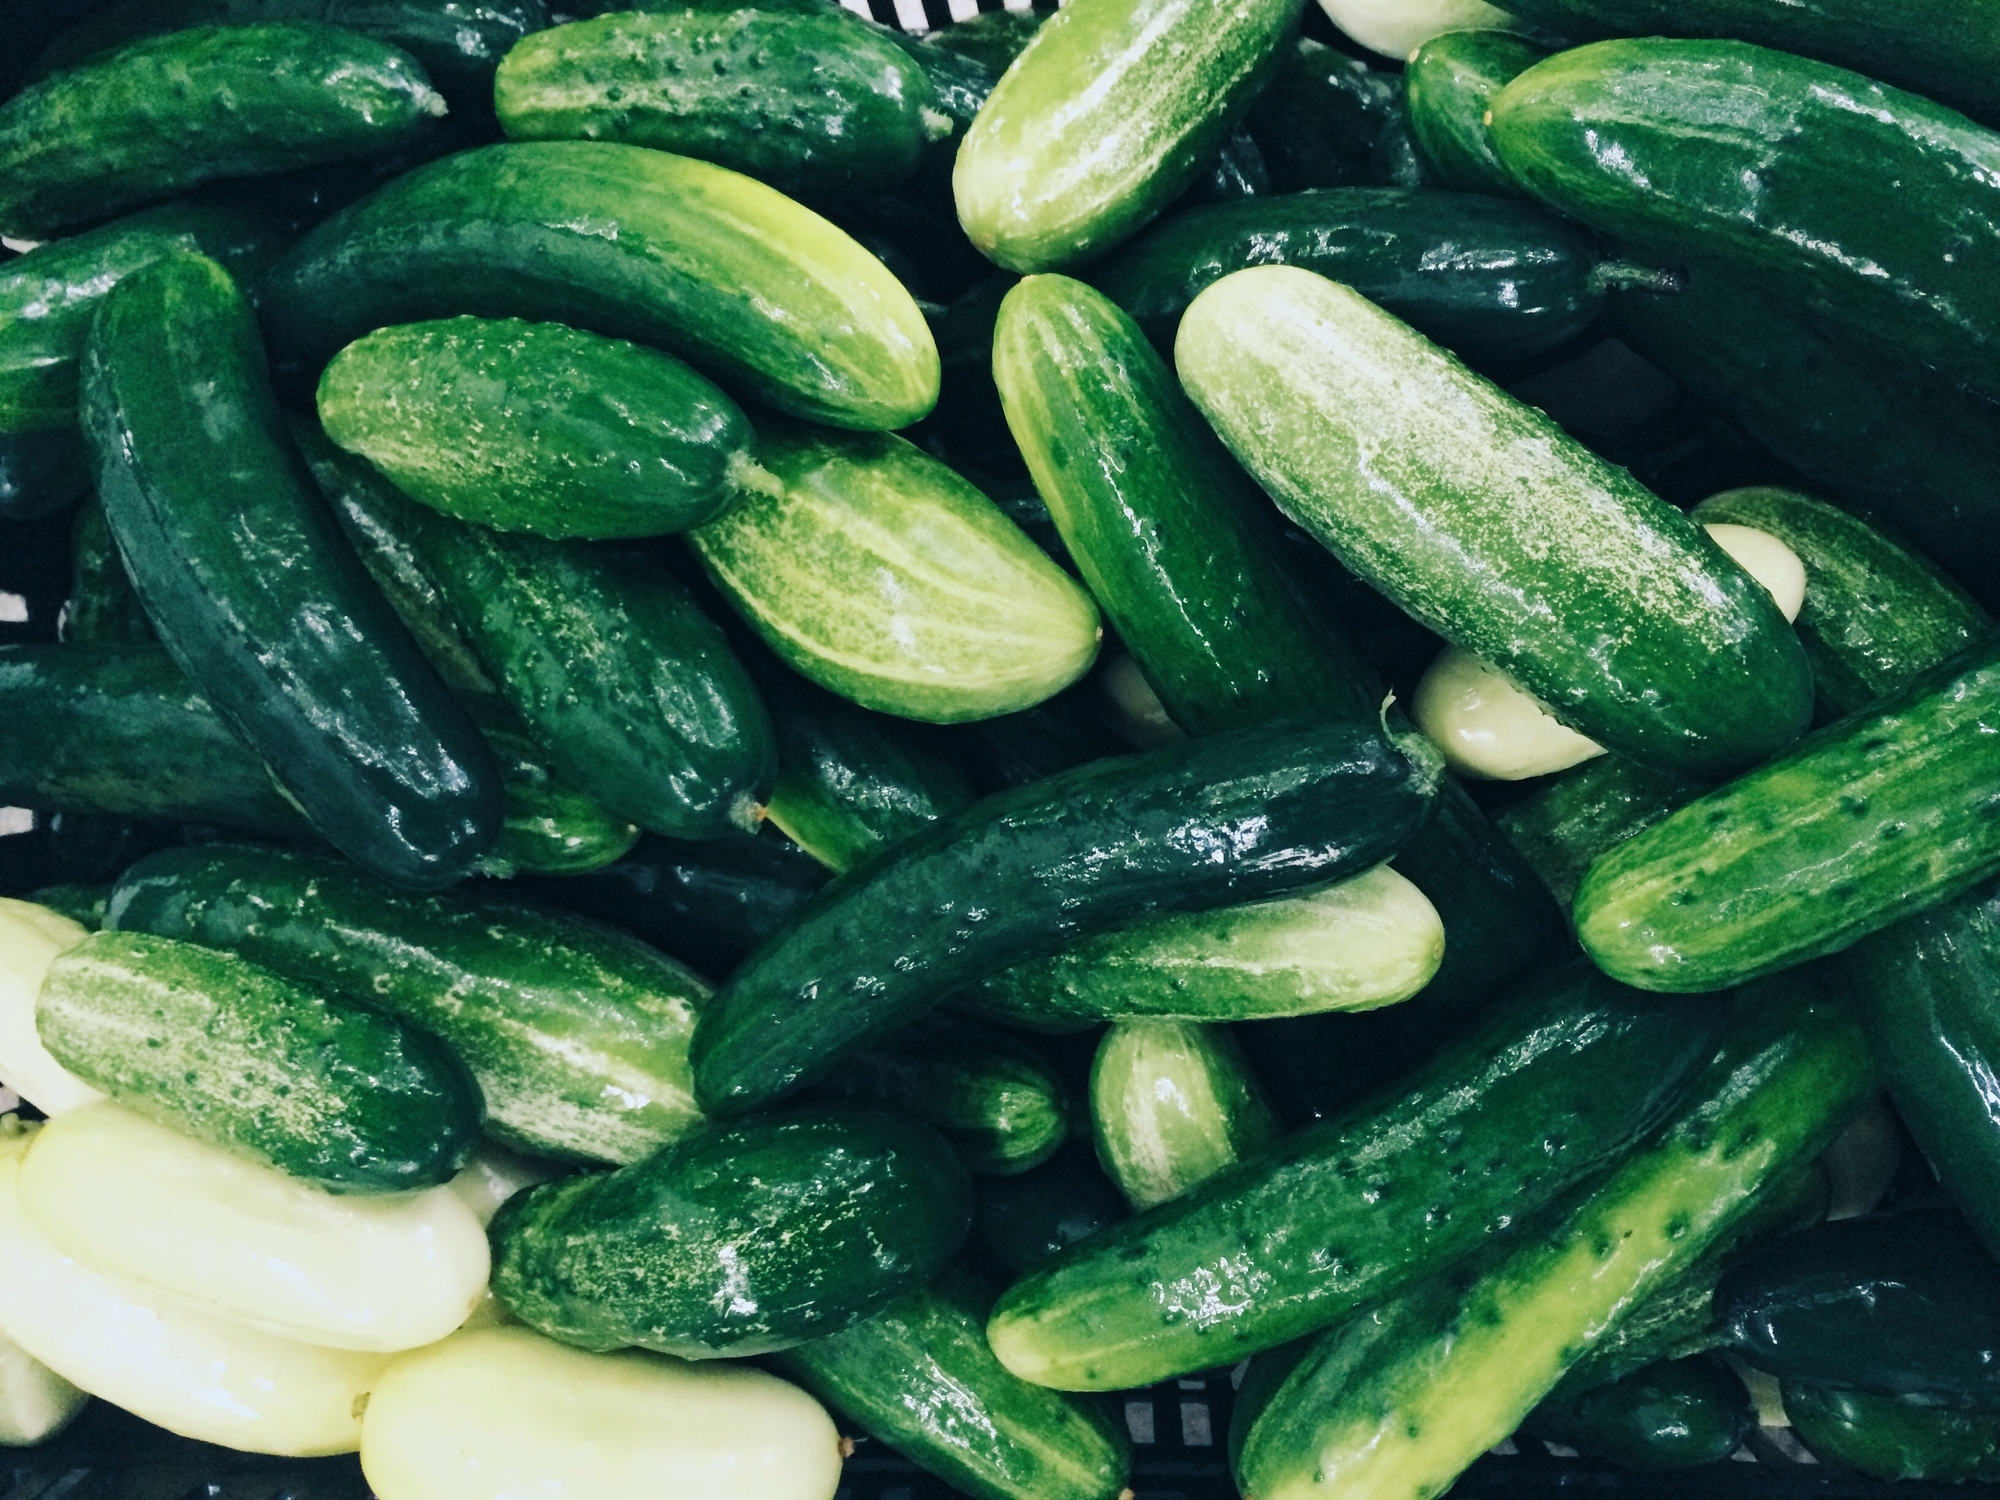 Picklers and Salt + Pepper cucumbers